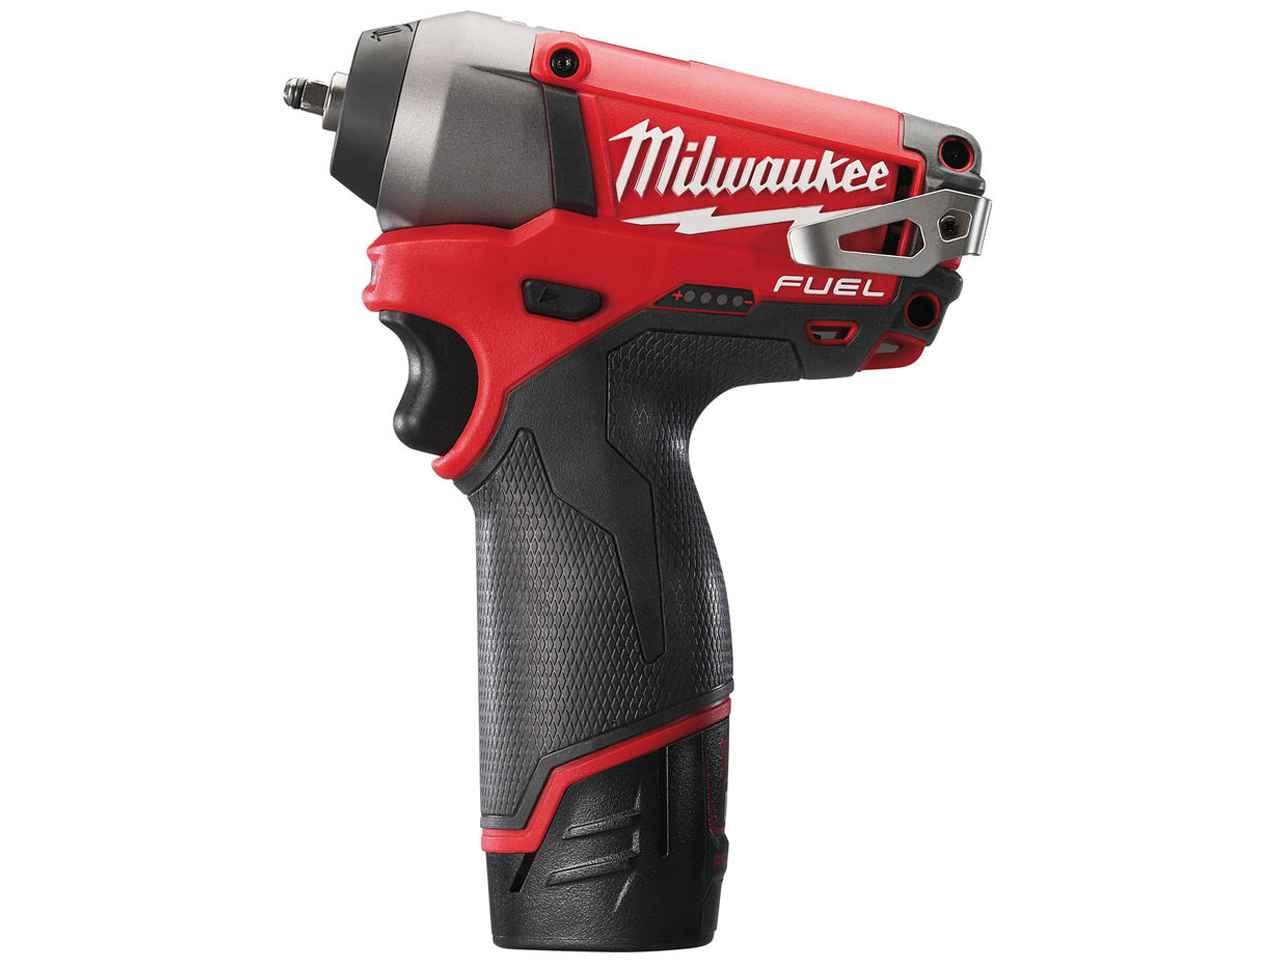 Milwaukee M12CIW14-202C 12v FUEL 1/4in Impact Wrench 2 x 2.0Ah Li-ion